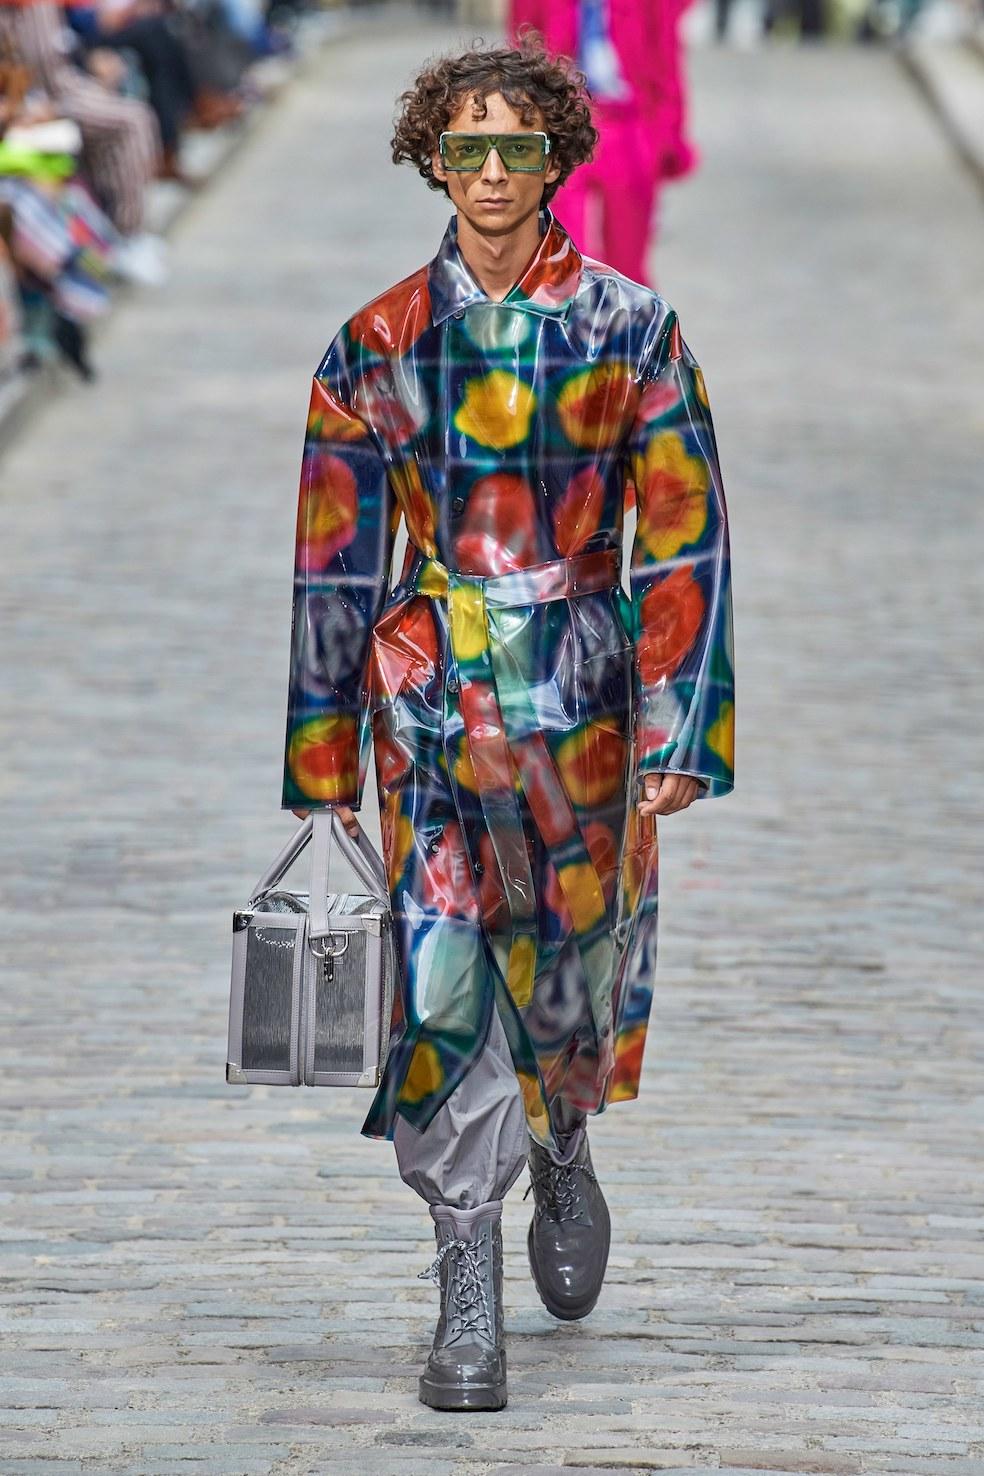 Louis_Vuitton_SS20_Behind_The_Blinds_Magazine__FIO0280.jpg